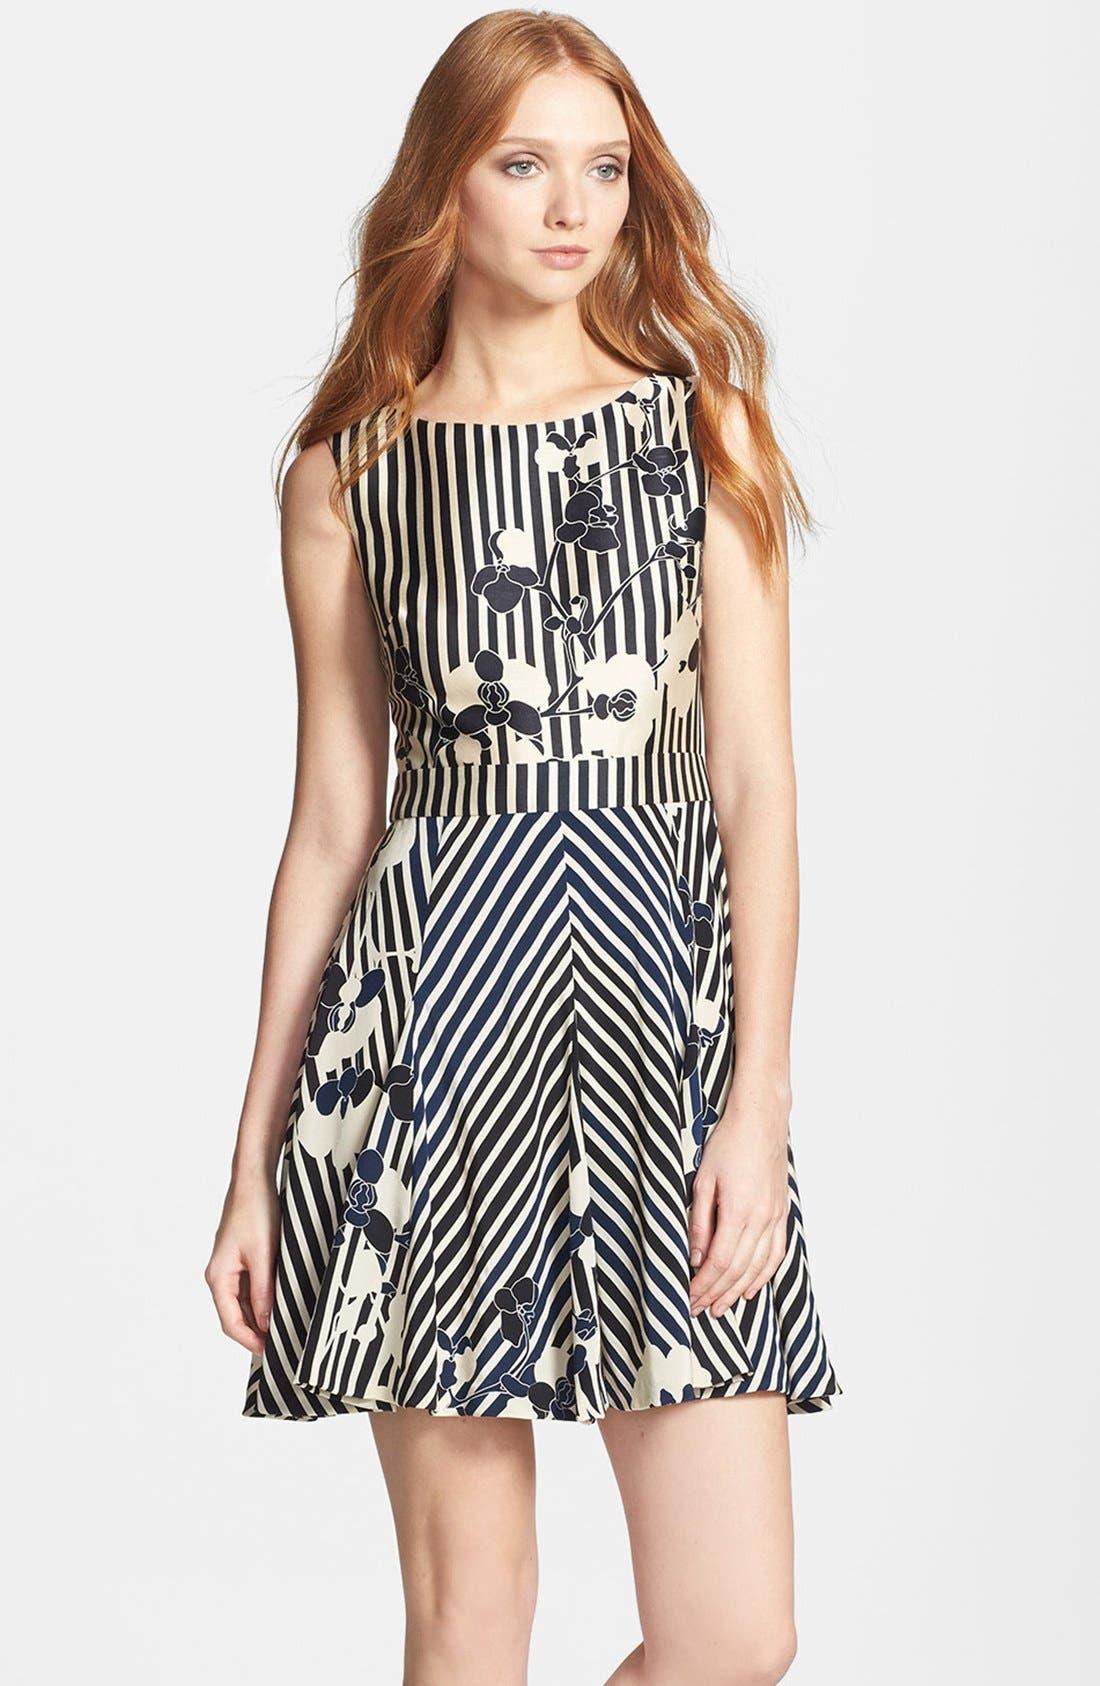 Main Image - Diane von Furstenberg 'Kiman' Print Wool Blend A-Line Dress